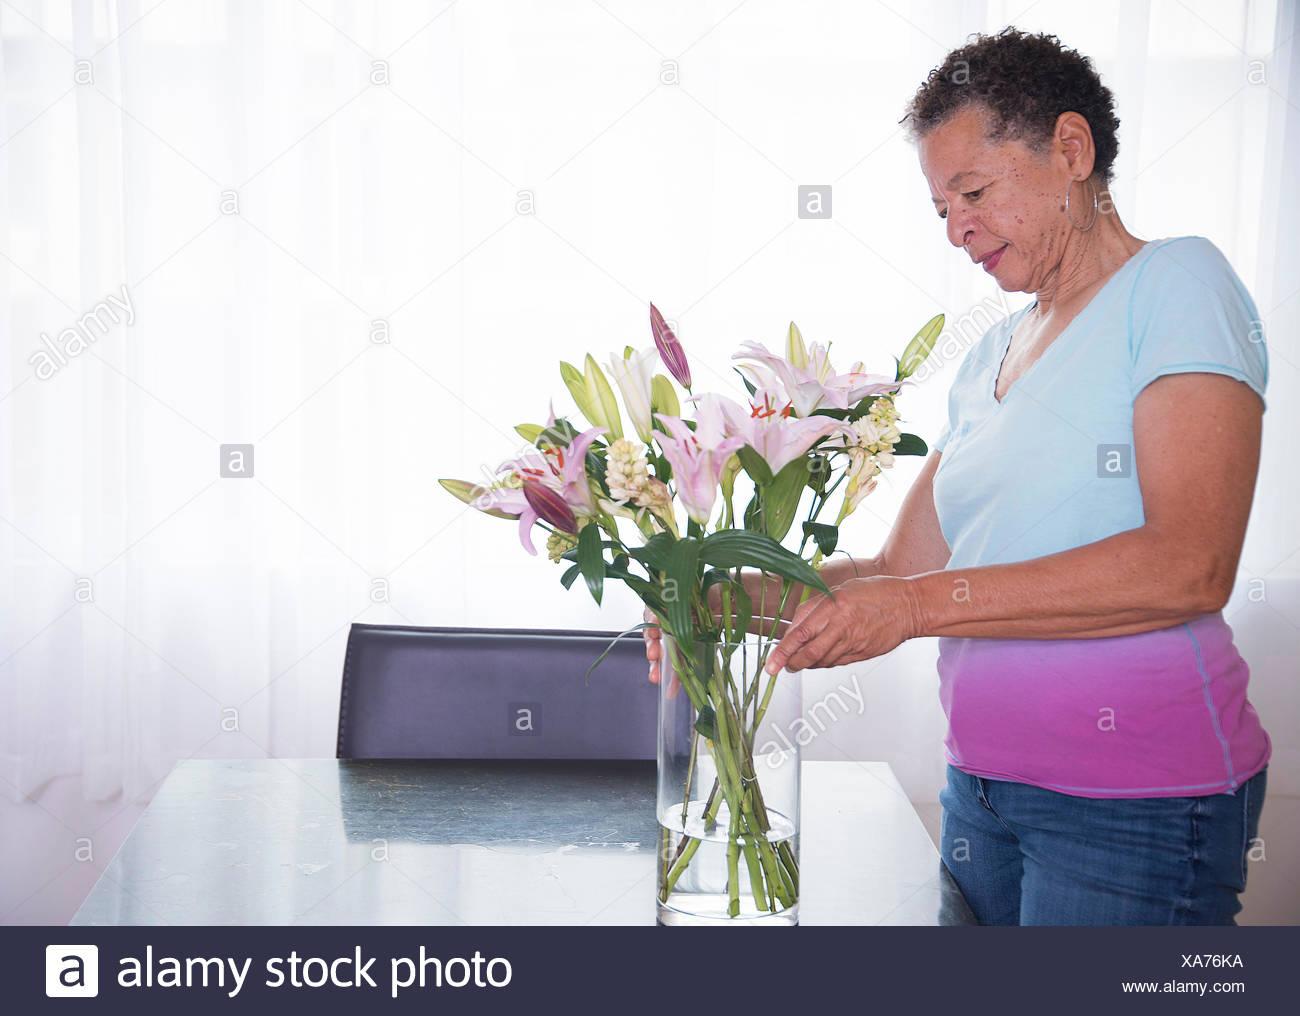 Senior woman arranging vase of flowers Stock Photo